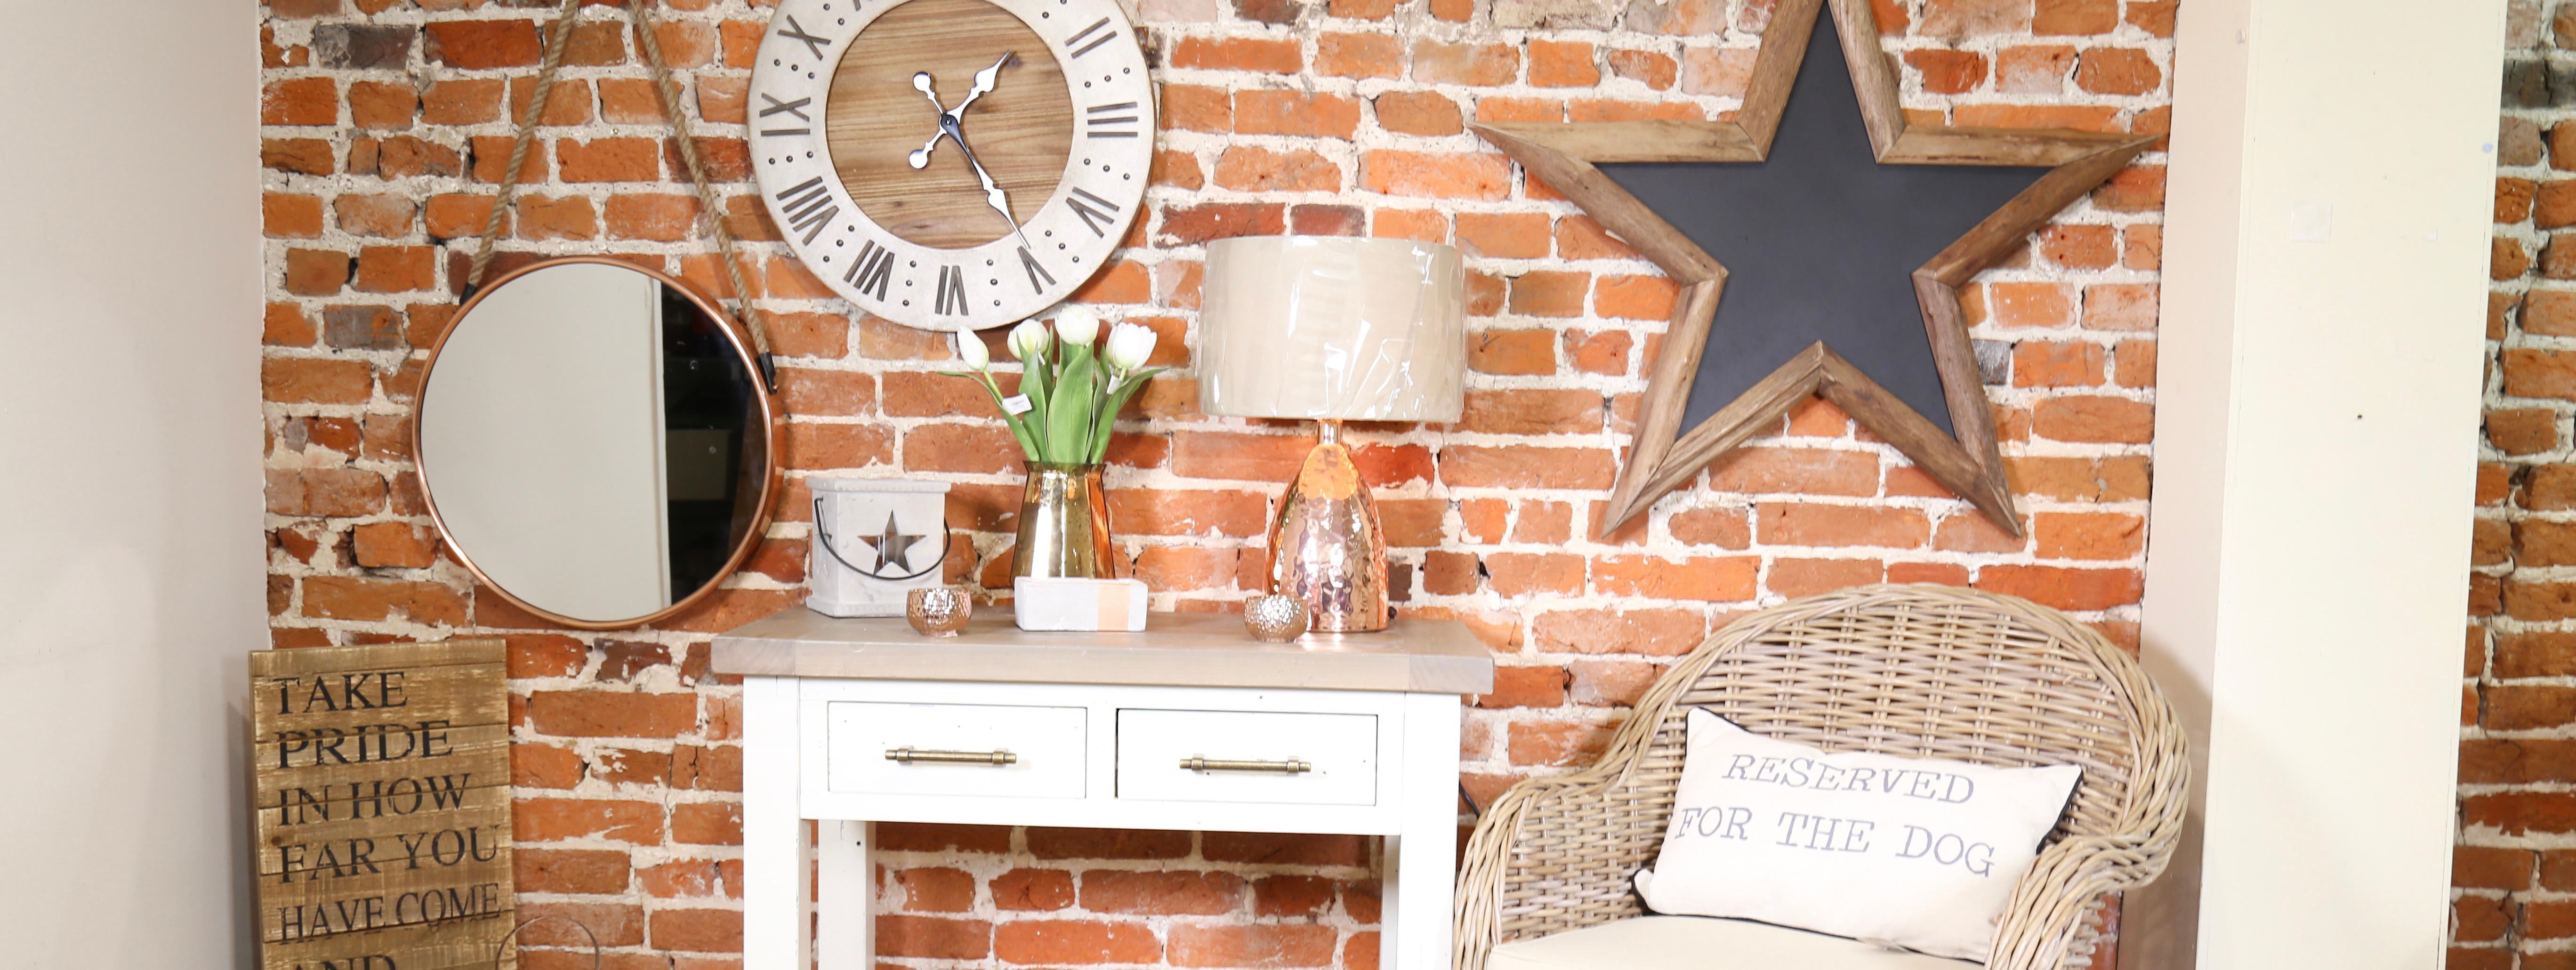 rustic look furniture. Creating The Urban Rustic Look Rustic Look Furniture I